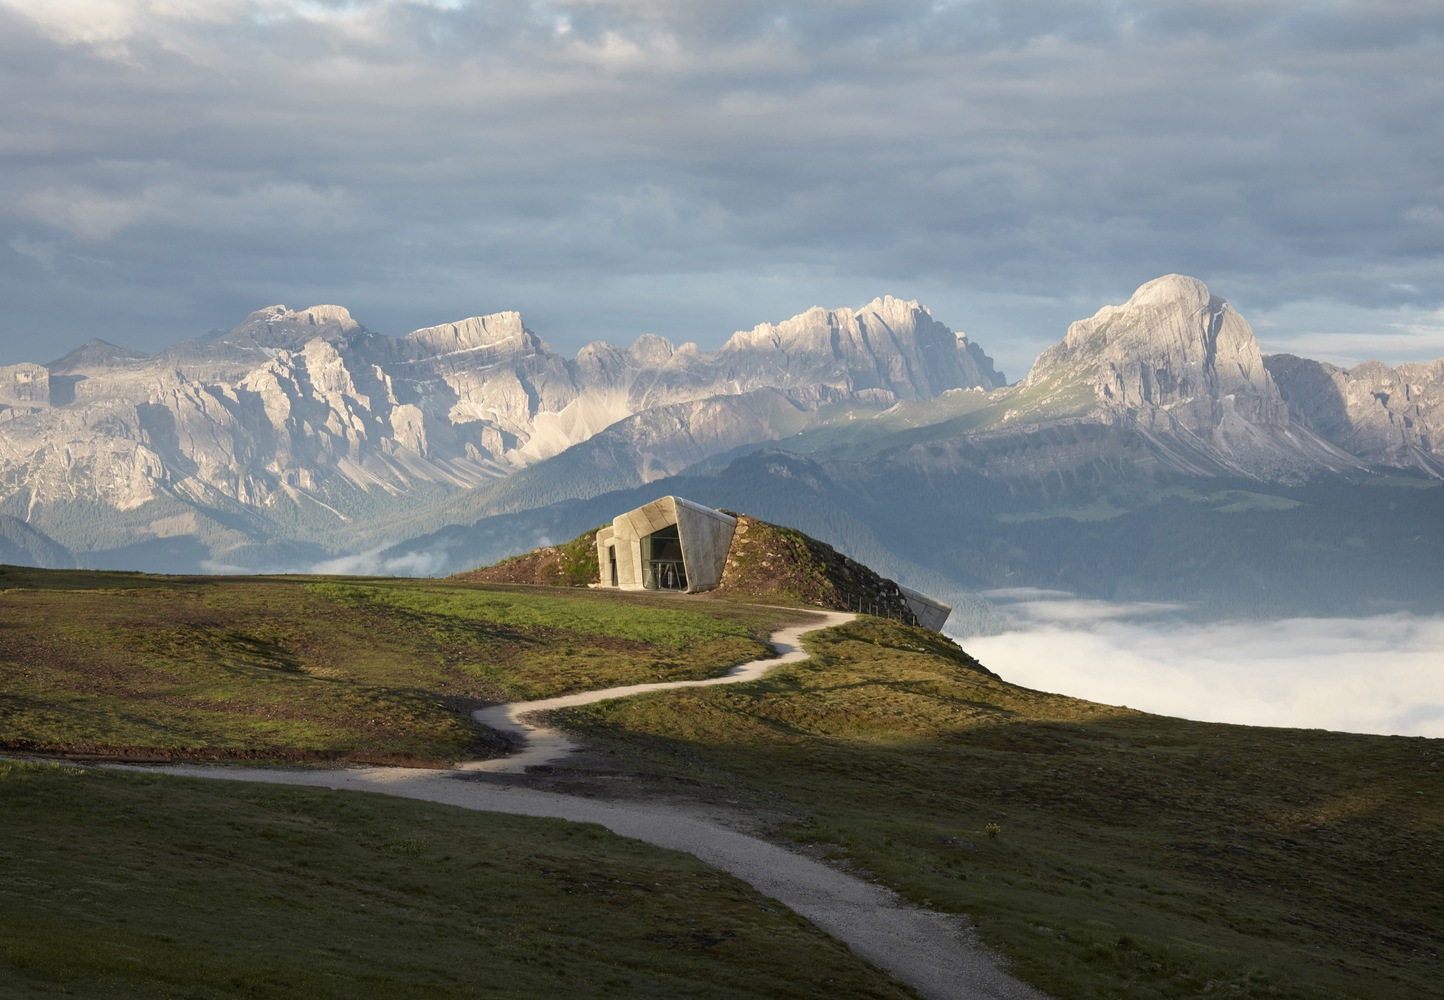 Museu Messner da Montanha Corones / Zaha Hadid Architects. Foto: Tom Roe/arcaidimages.com/Sto.